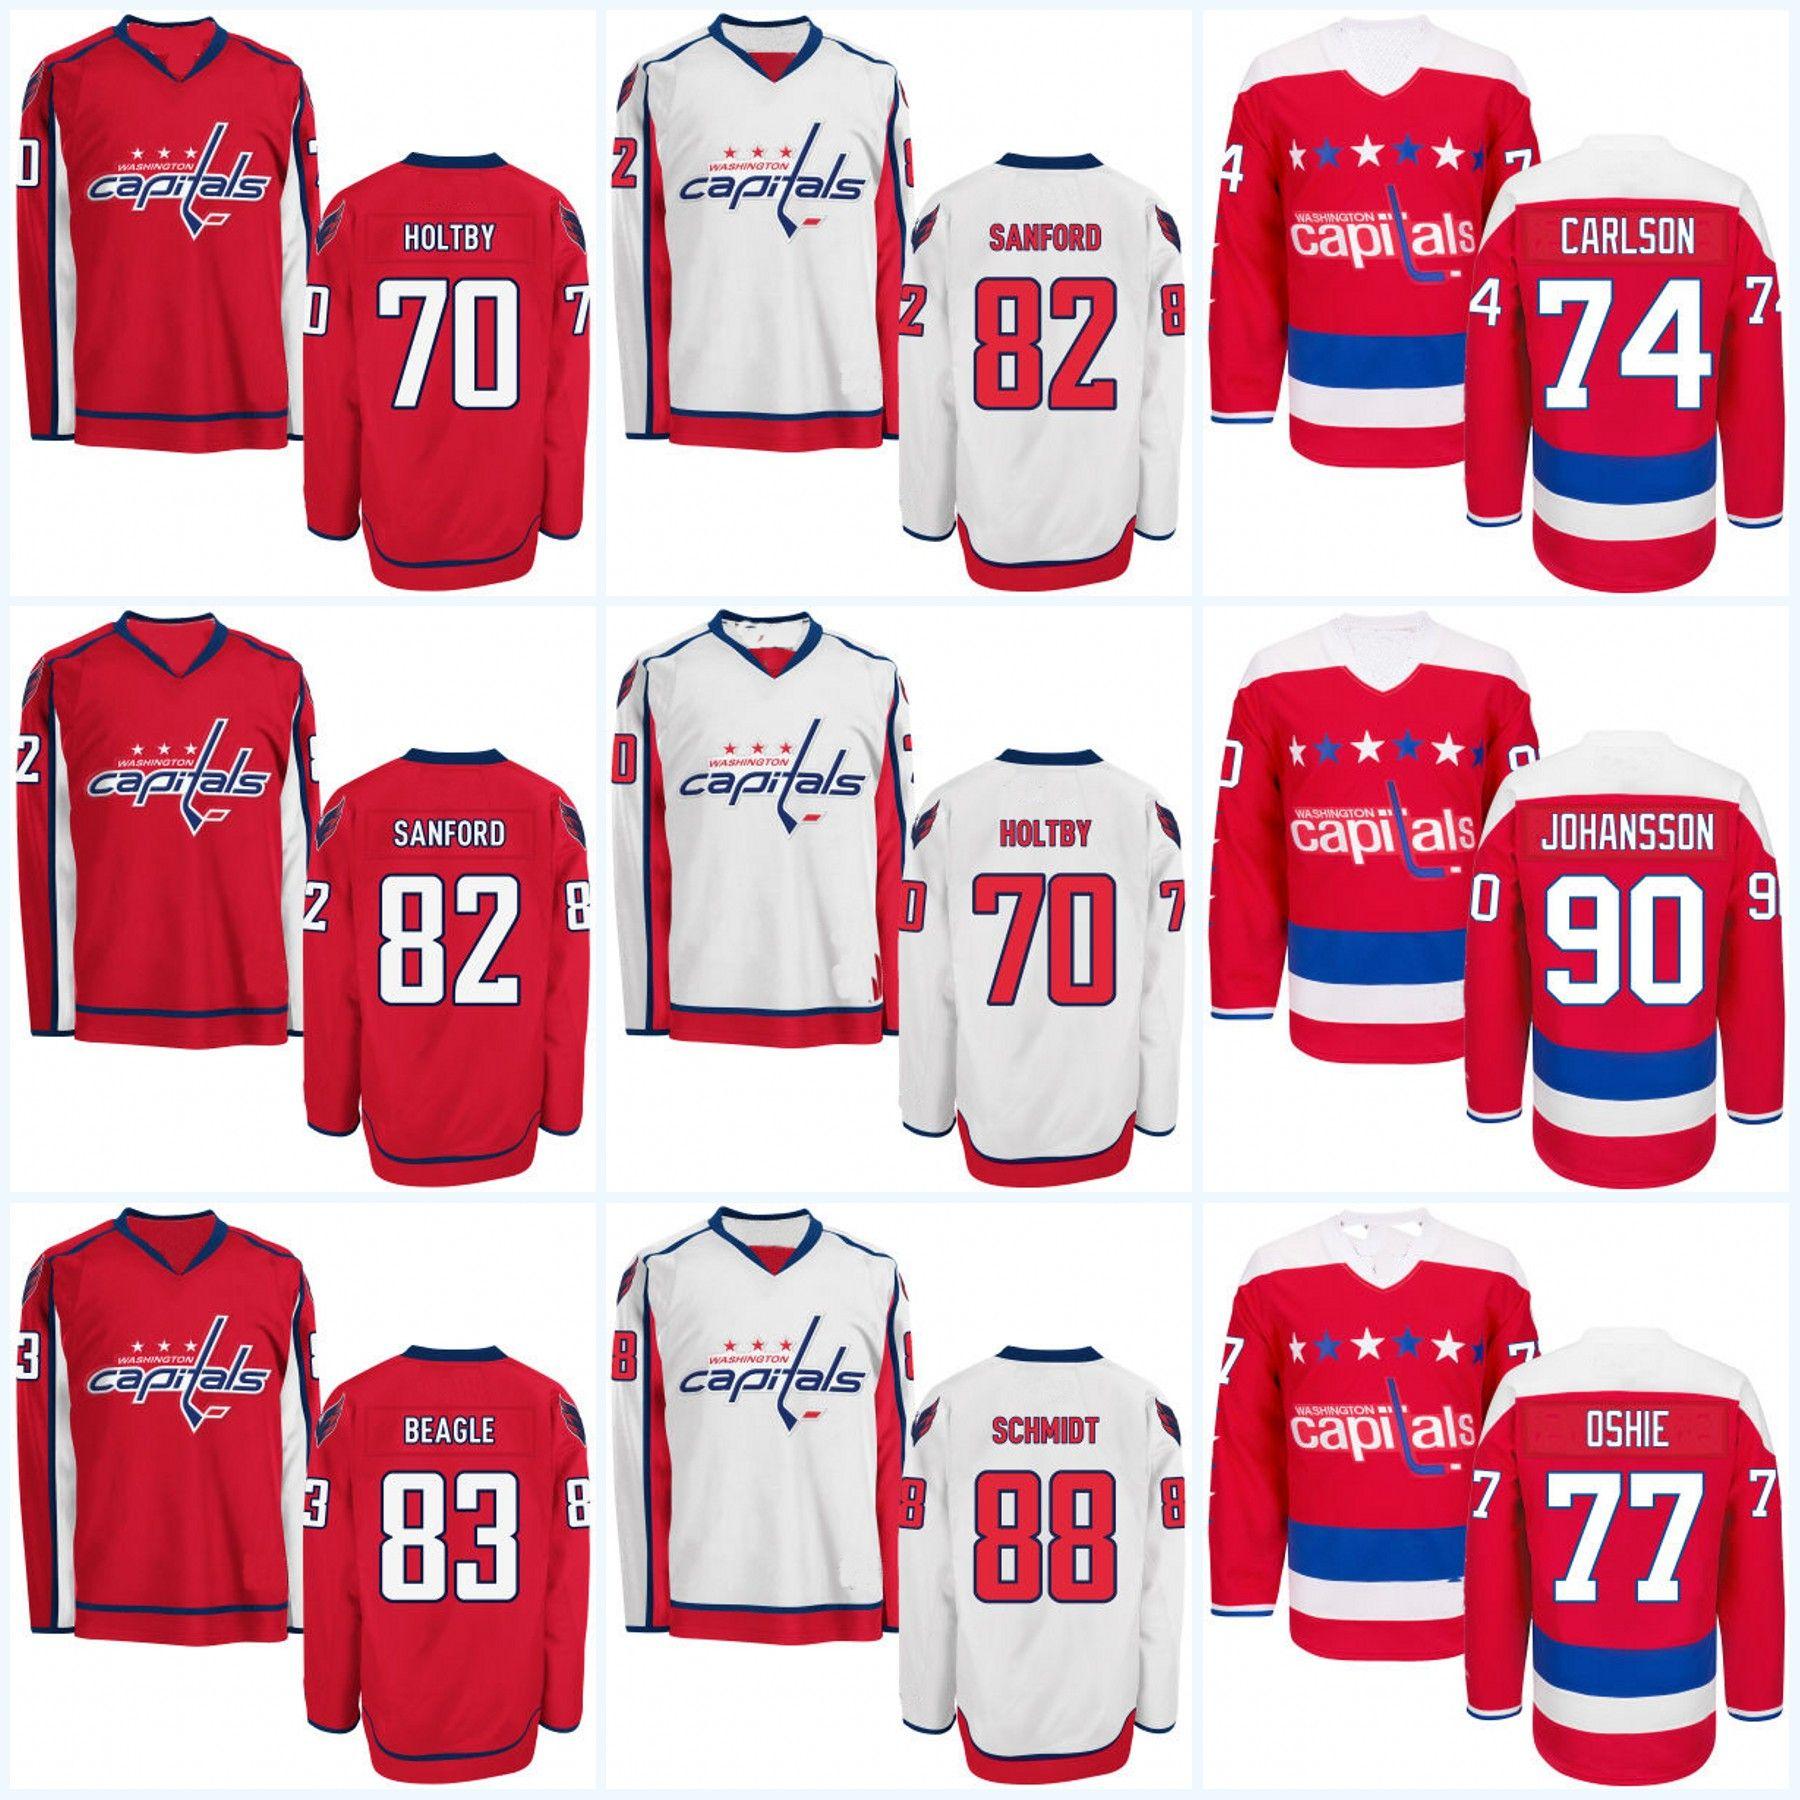 buy popular 82044 f6f1d Washington Capitals Jerseys Womens 70 Braden Holtby 74 John Carlson 83 Jay  Beagle 90 Marcus Johansson 88 Nate Schmidt Hockey Jerseys